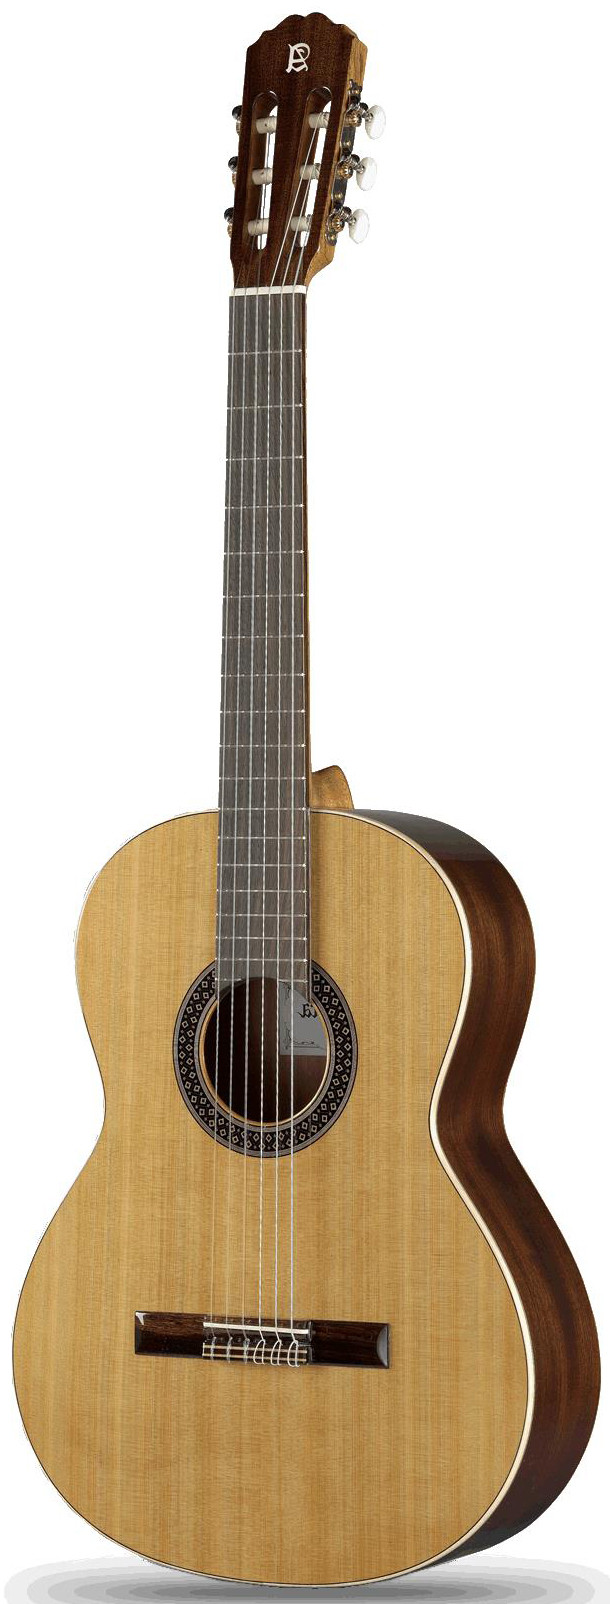 Гитара Alhambra 6.502 Classical Student 1C LH